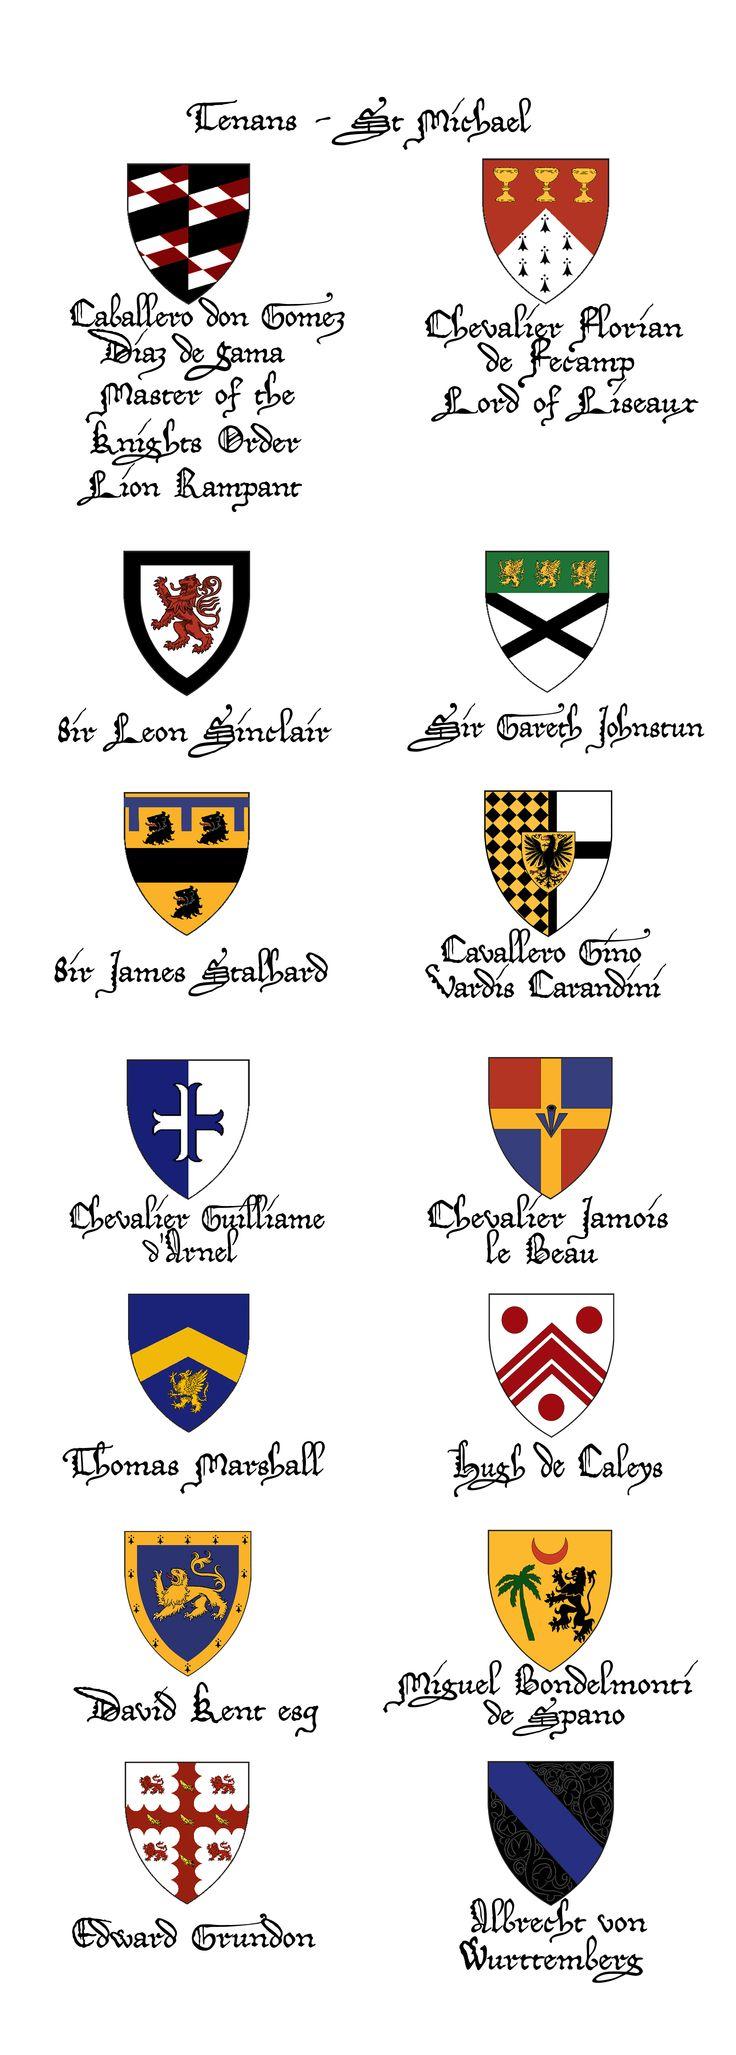 Knights Order Lion Rampant - tenans at Abbey Medieval Fair 2011